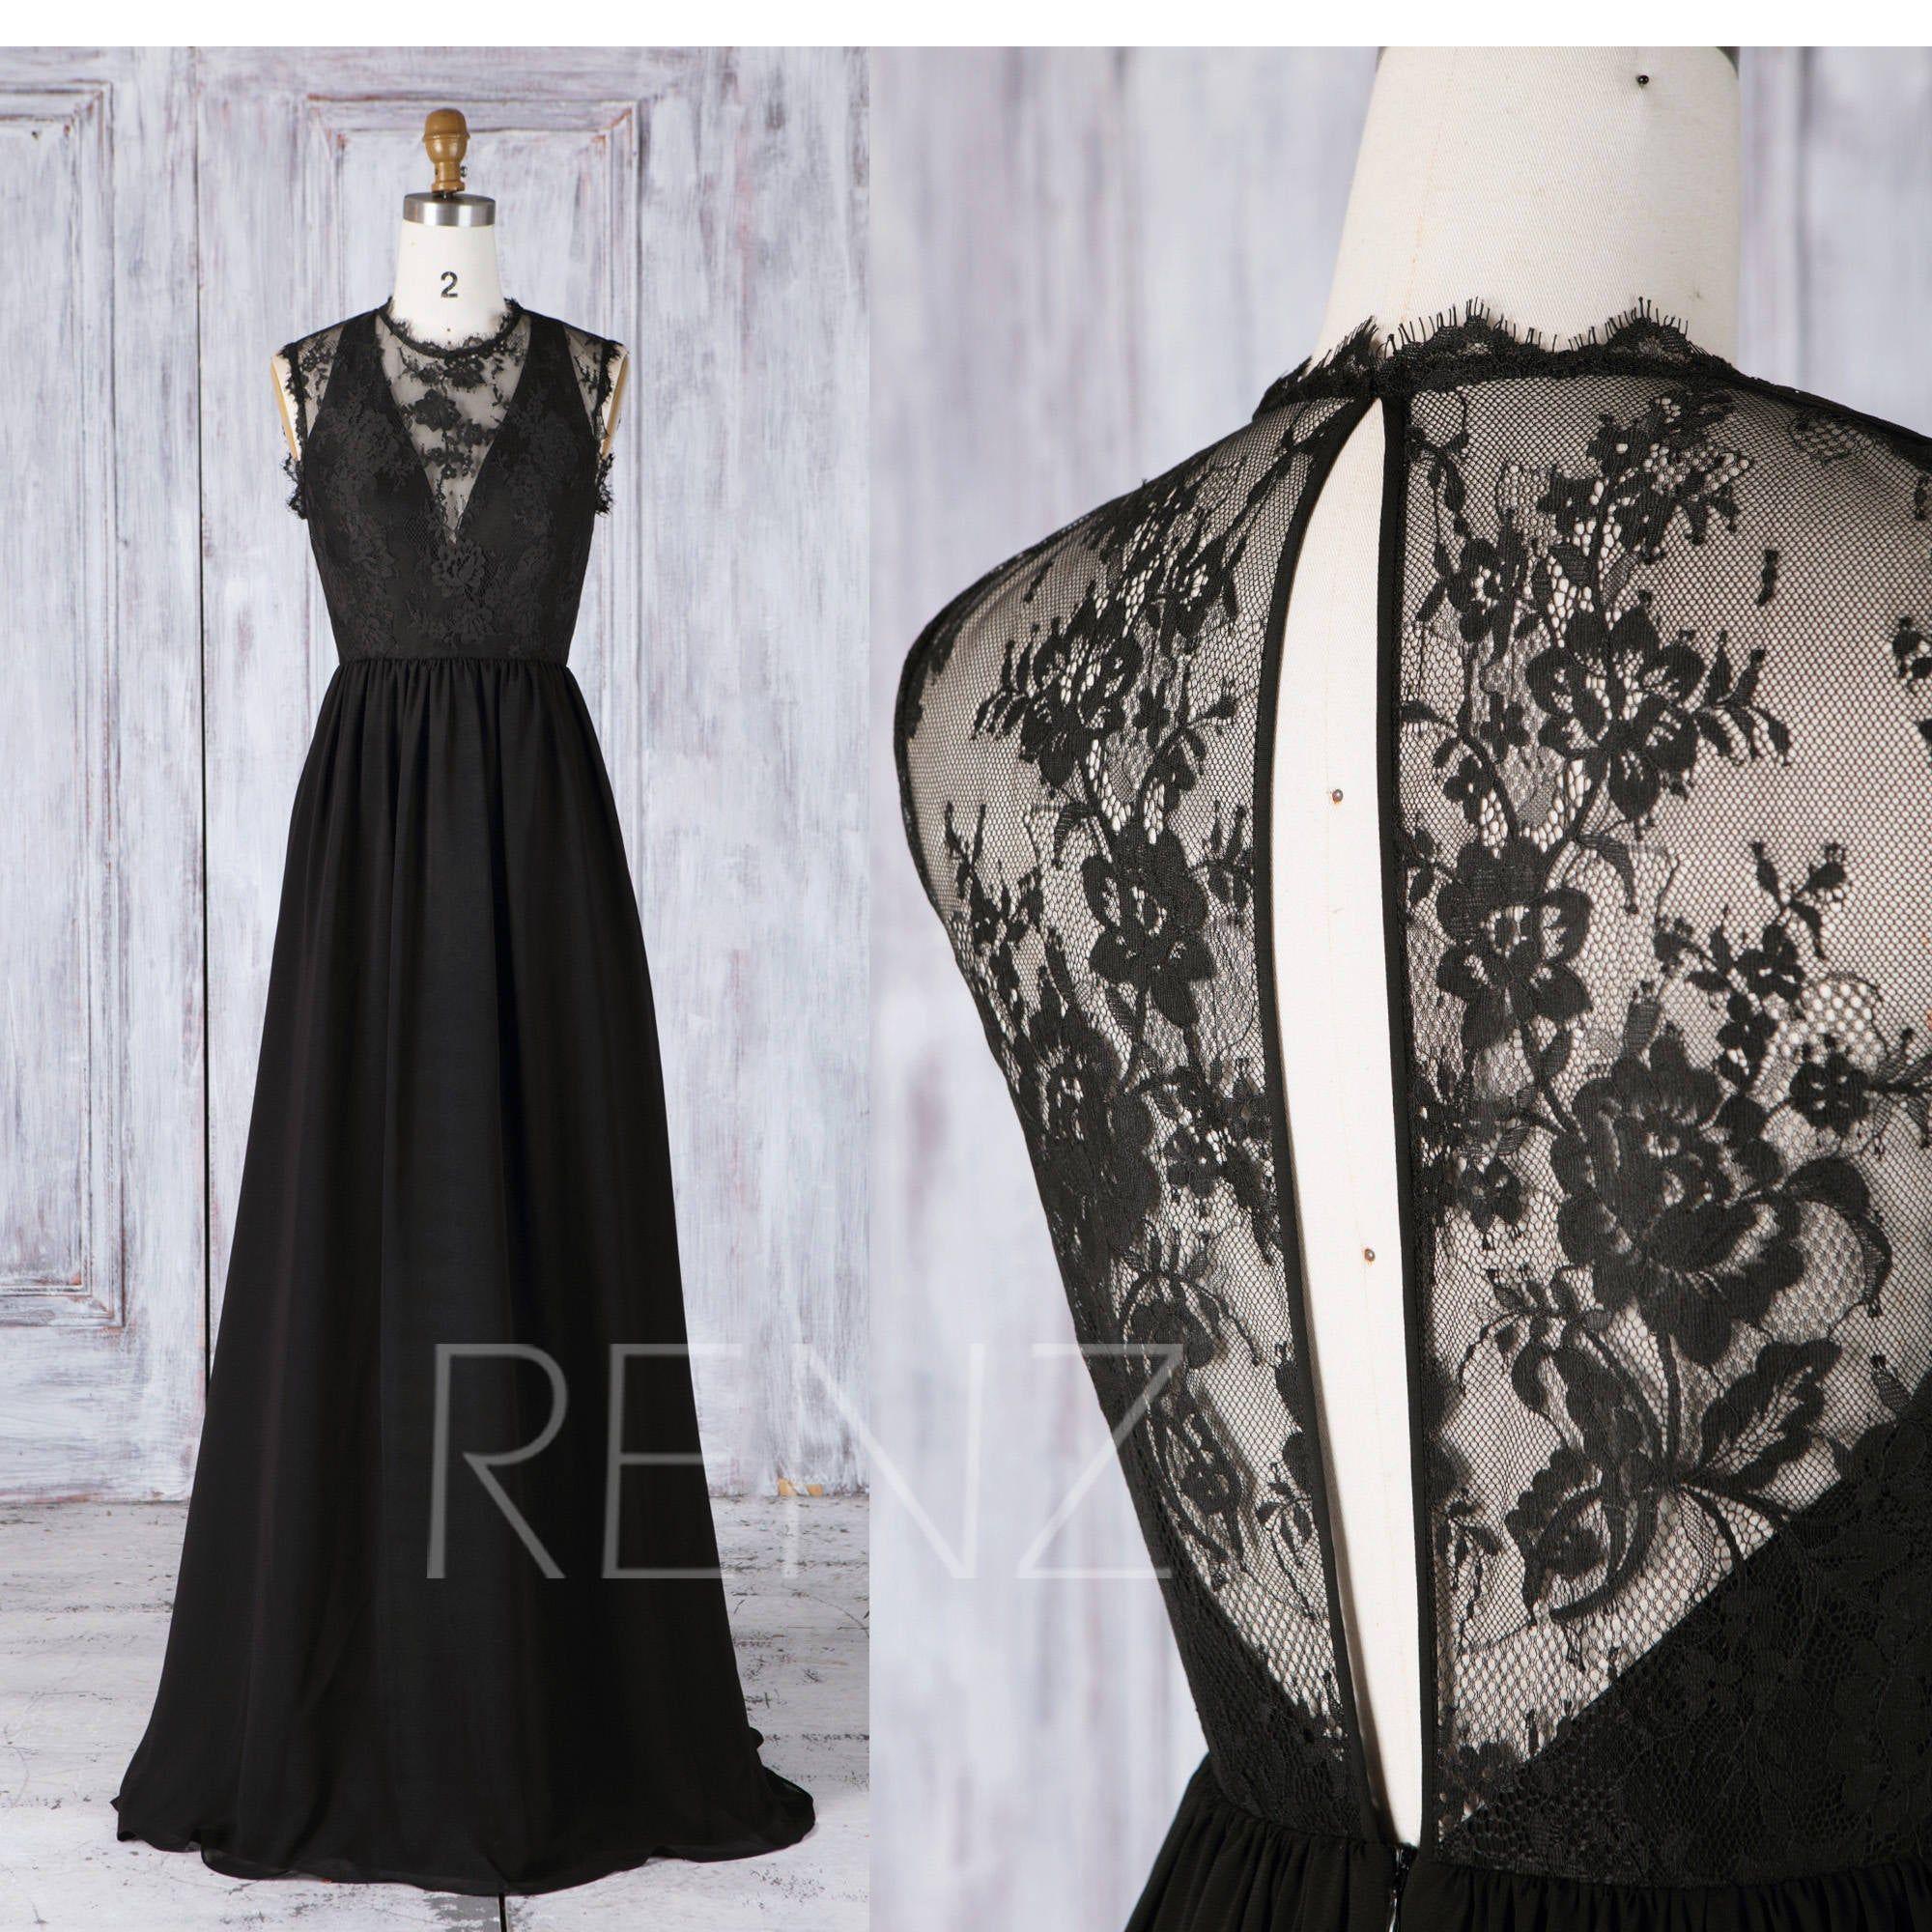 Bridesmaid Dress Black Chiffon Wedding Dress Illusion Deep V Etsy In 2020 Black Bridesmaid Dresses Party Dress Long Black Chiffon Bridesmaid Dresses